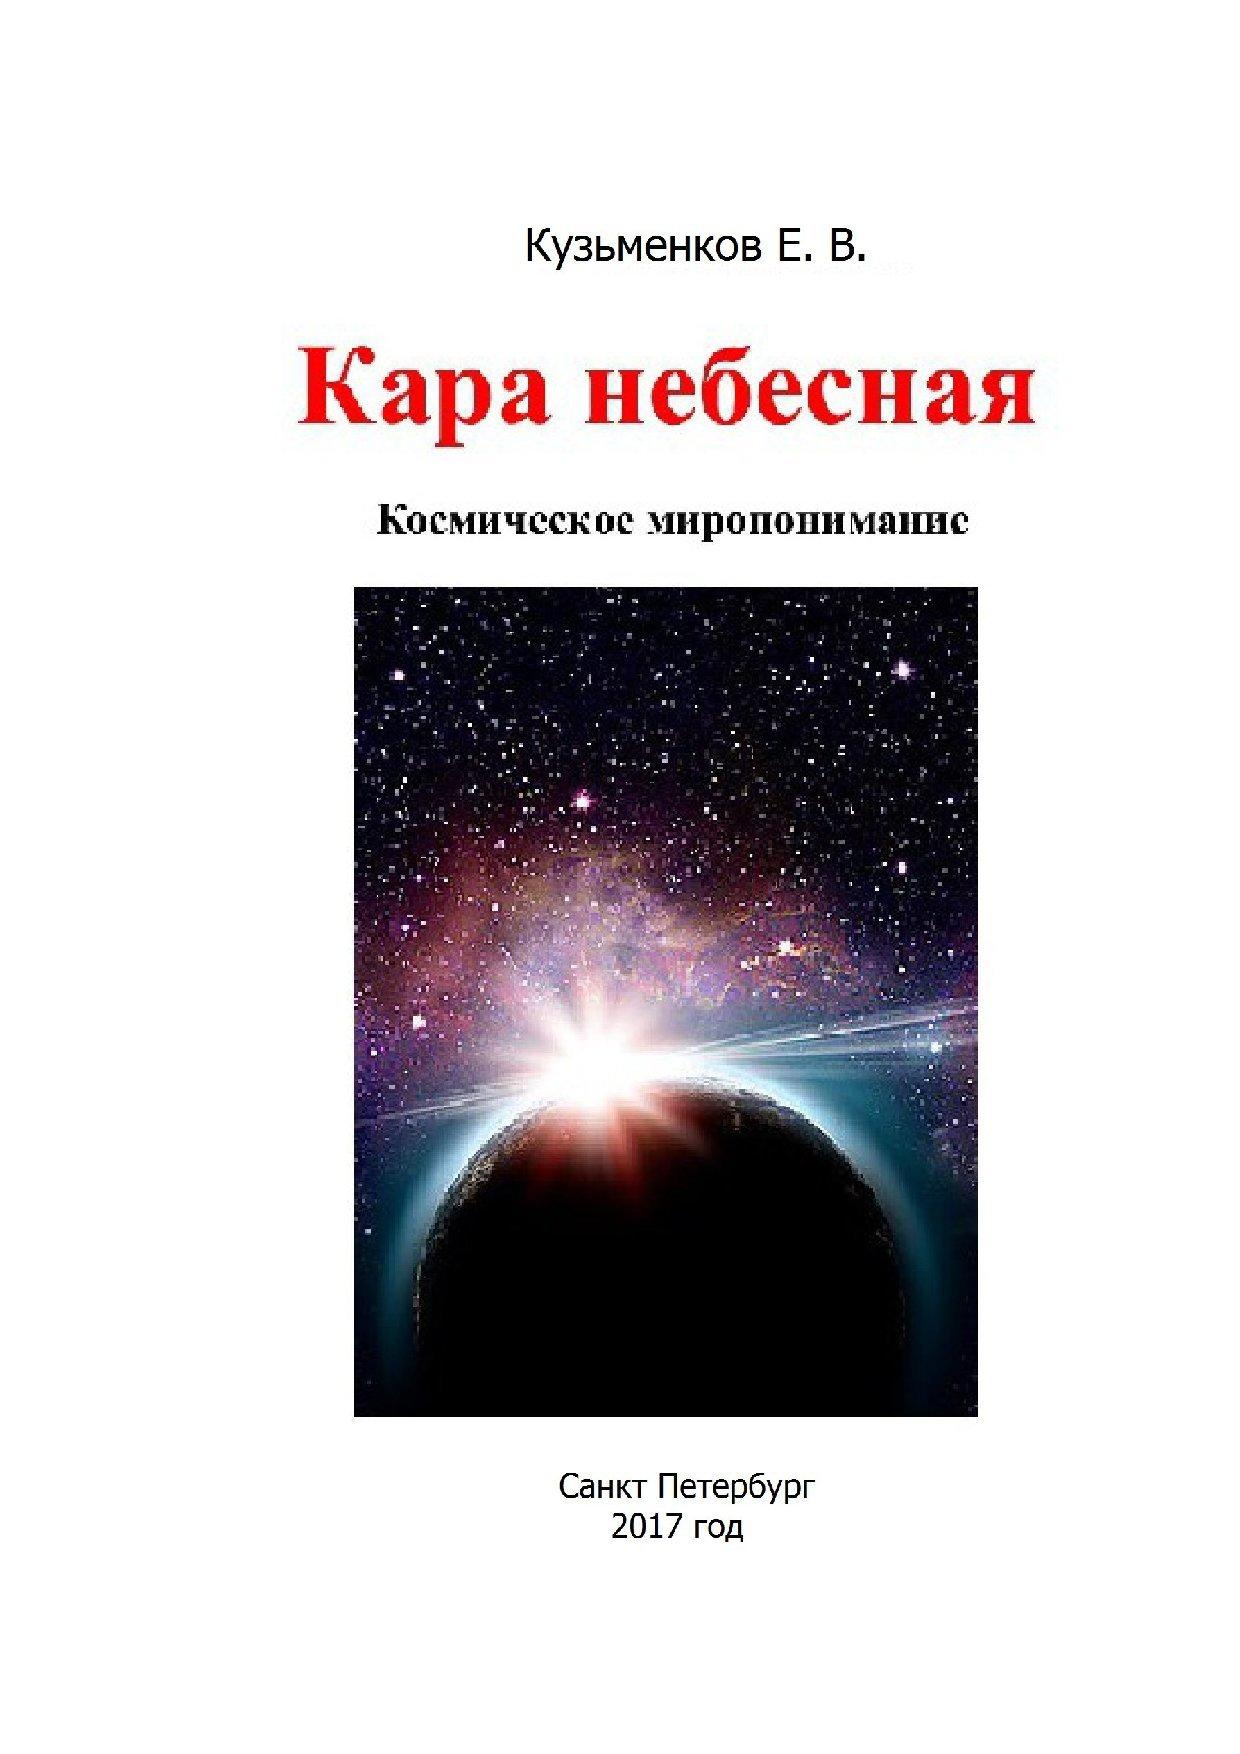 обложка книги static/bookimages/28/00/17/28001792.bin.dir/28001792.cover.jpg